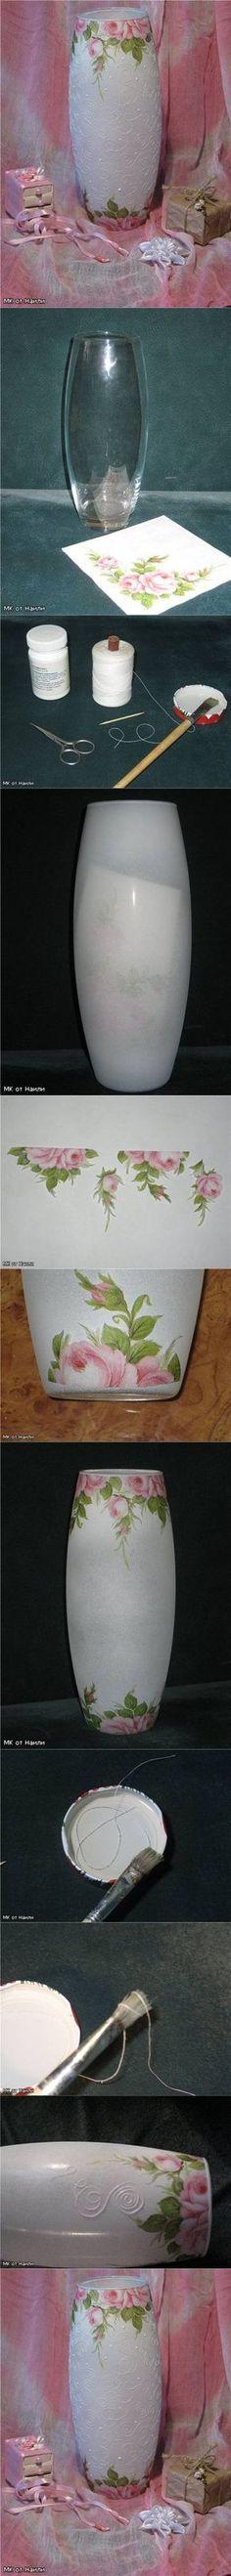 DIY How to Paint a Glass Jar | UsefulDIY.com Follow us on Facebook ==> https://www.facebook.com/UsefulDiy